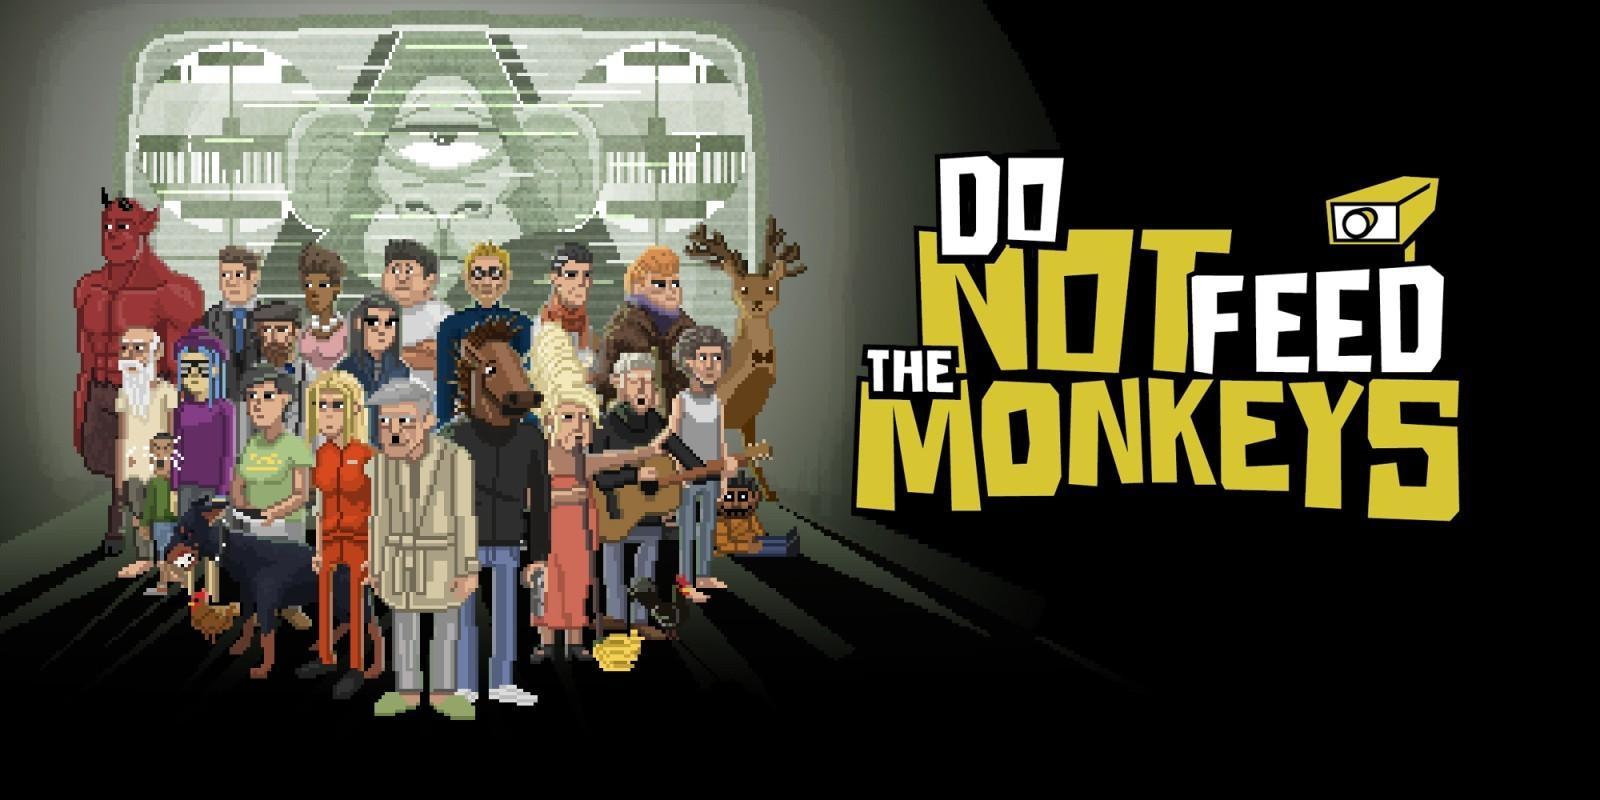 Do Not Feed the Monkeys 10